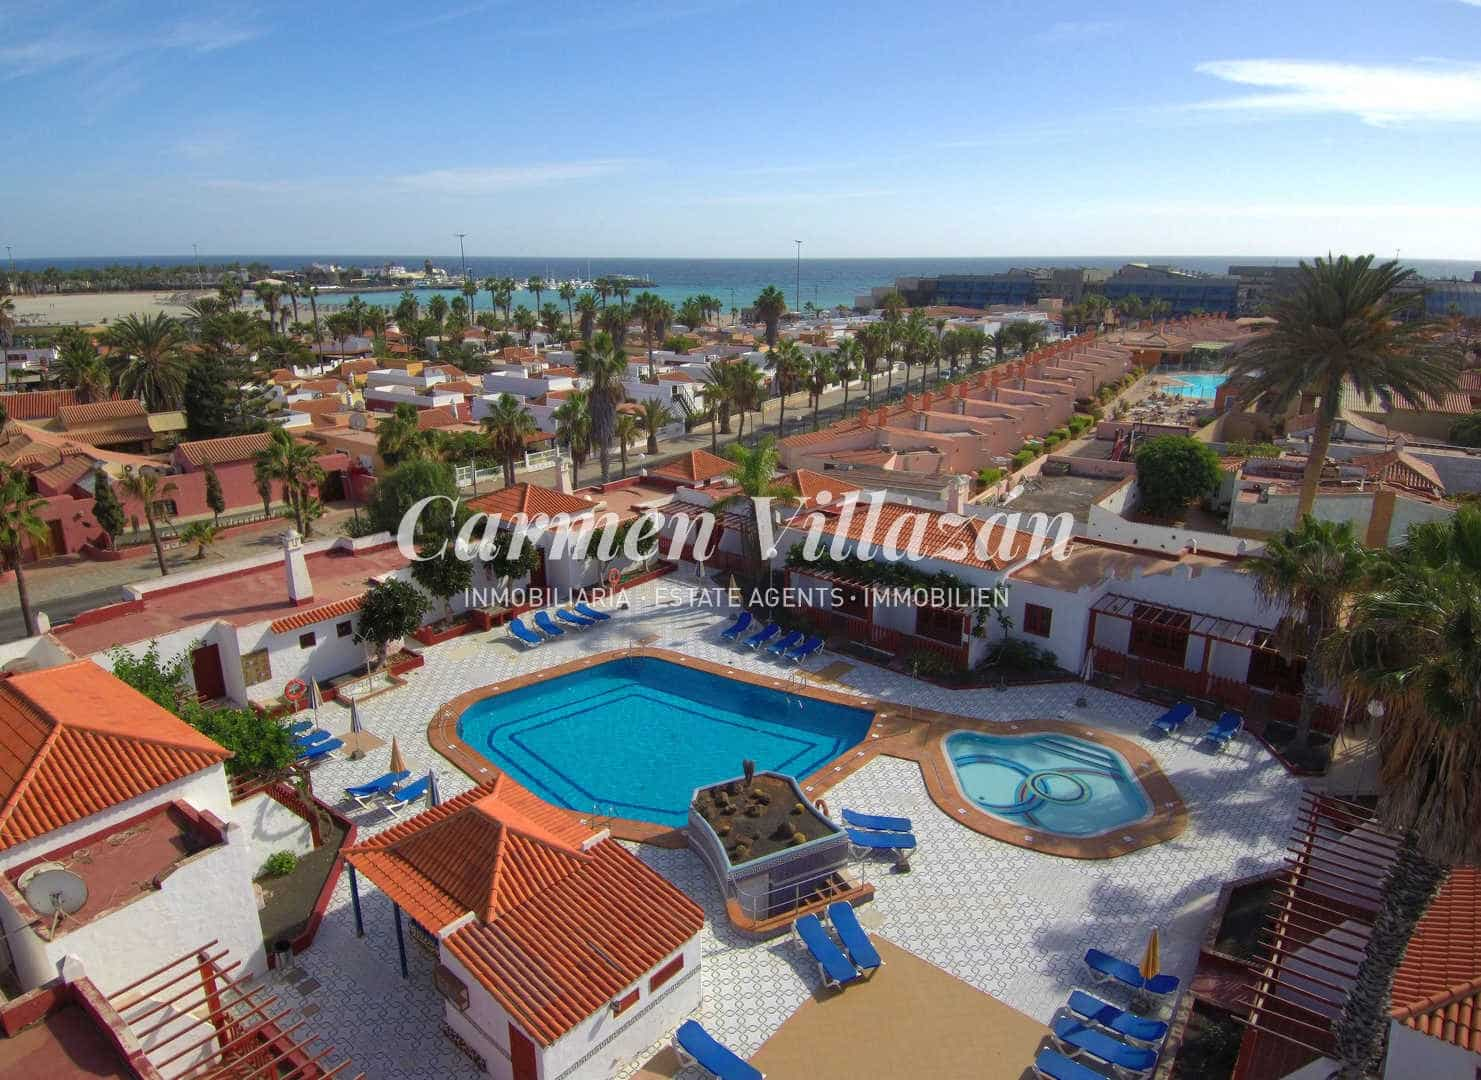 1 sovrum Bungalow till salu i Caleta de Fuste med pool - 100 000 € (Ref: 5635538)